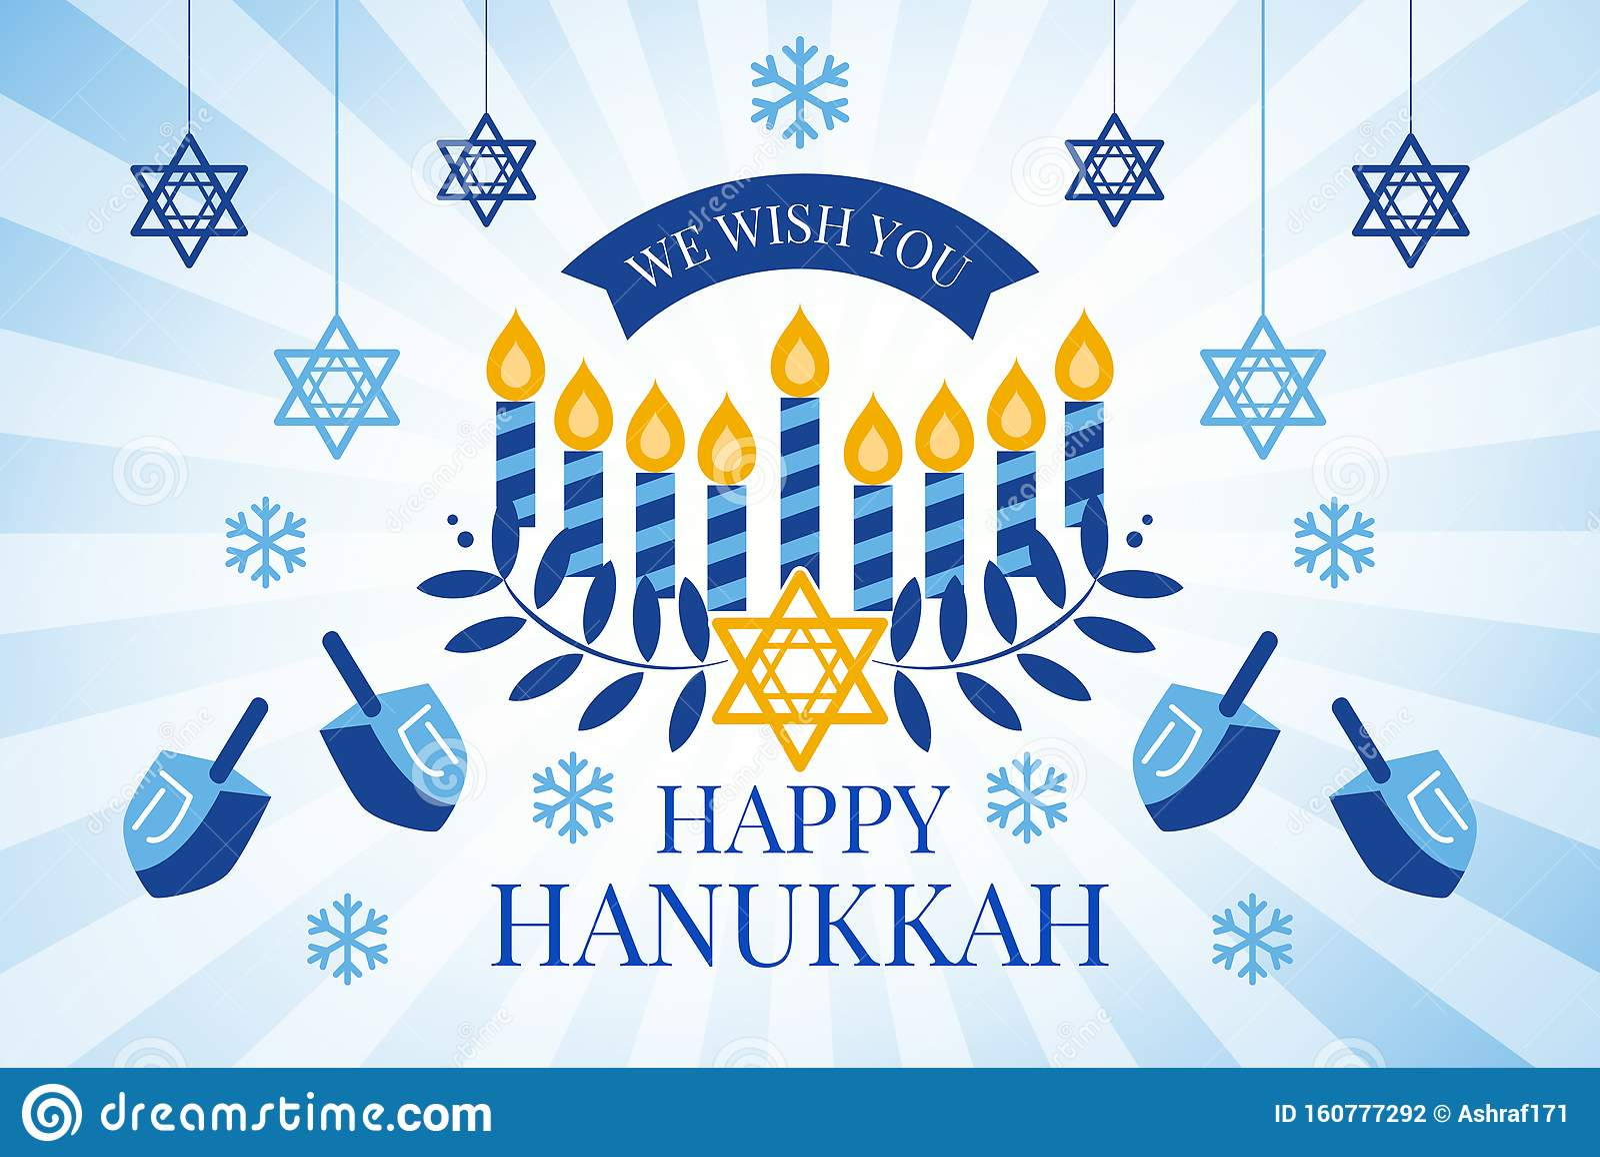 Happy Hanukkah greeting card with Torah, menorah and dreidels